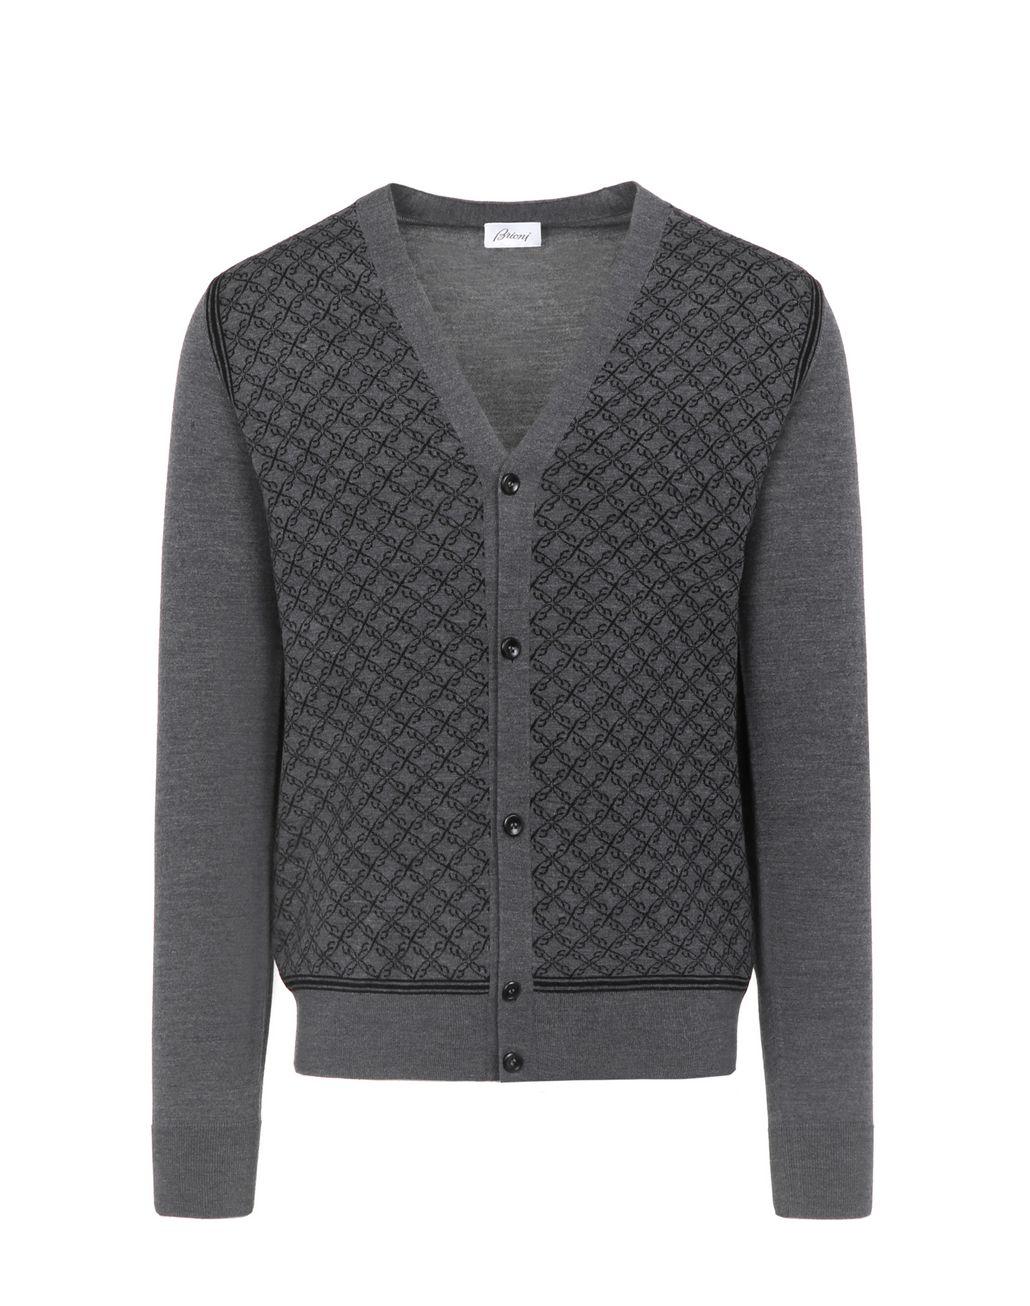 BRIONI Grey Jacquard Cardigan Knitwear Man f